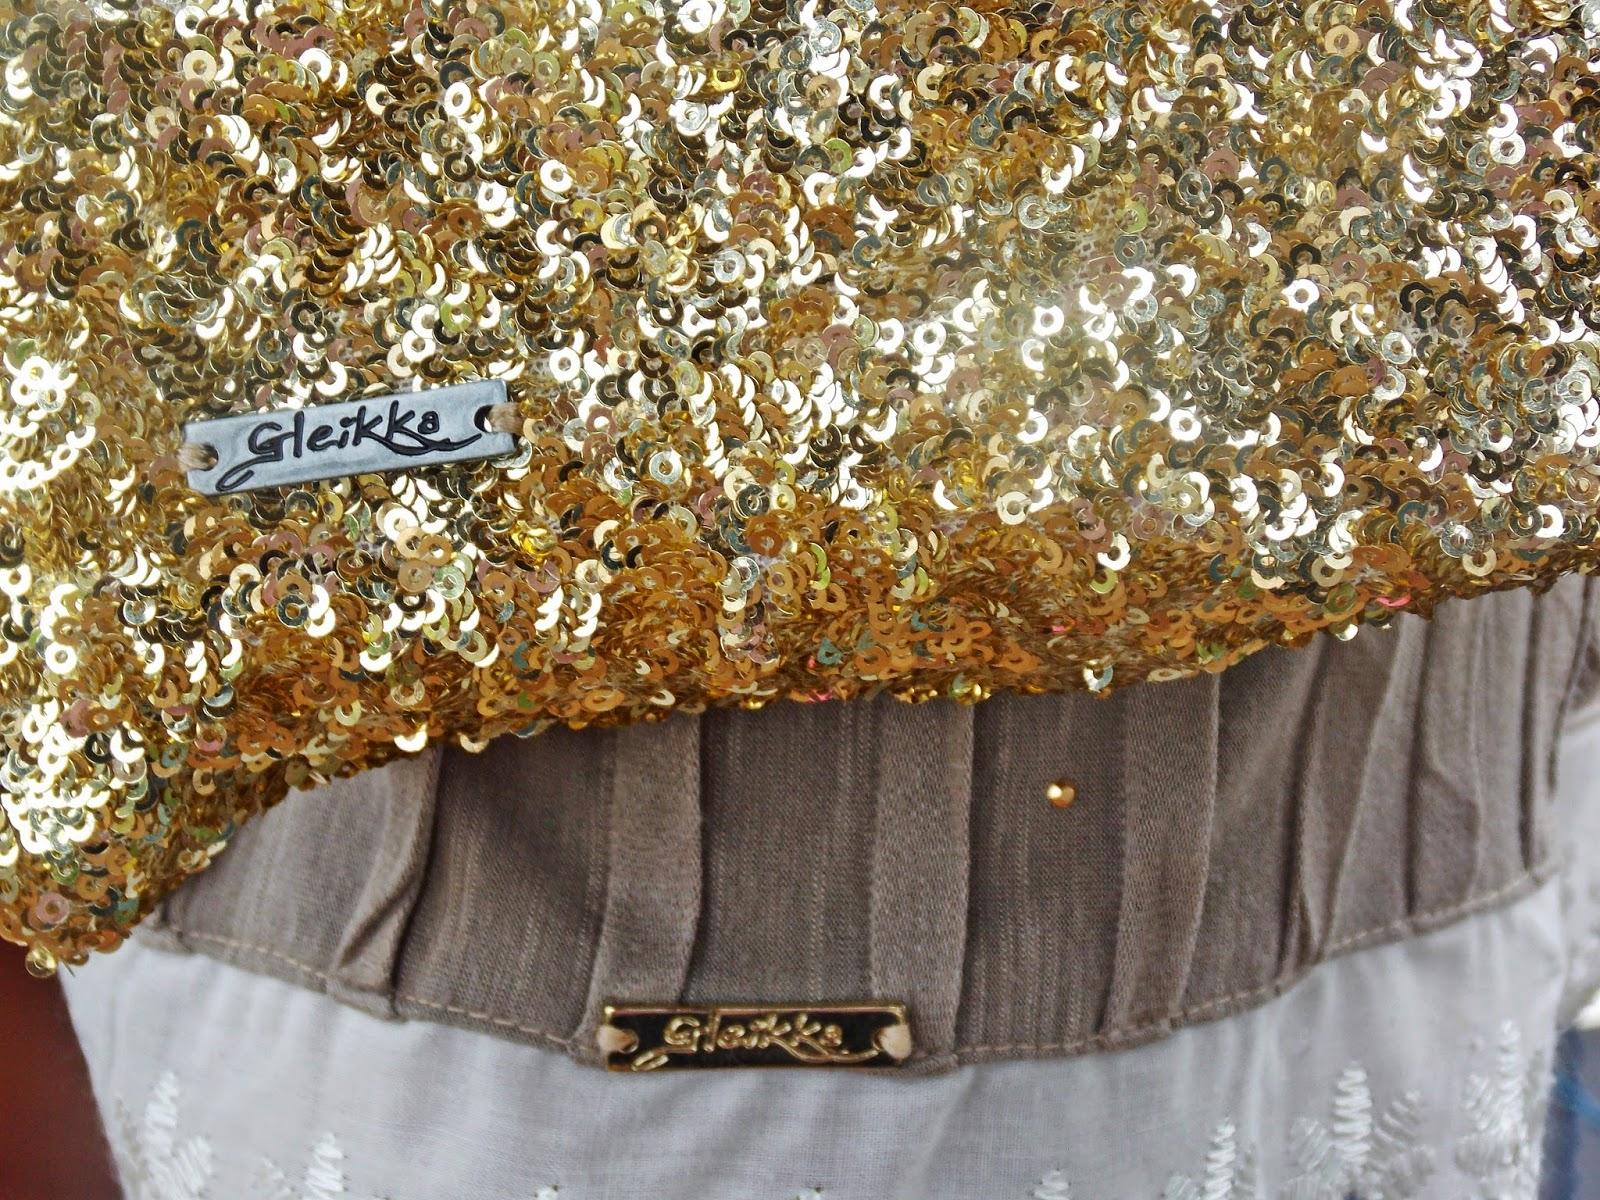 Look Gleikka, Blog, Saia, Blusa, Clutch de paetê, Sandália colorida, Vizzano, Mistura de texturas, Moda 2014, Cinto largo, Look do dia, Camisa feminina, Saia rodada